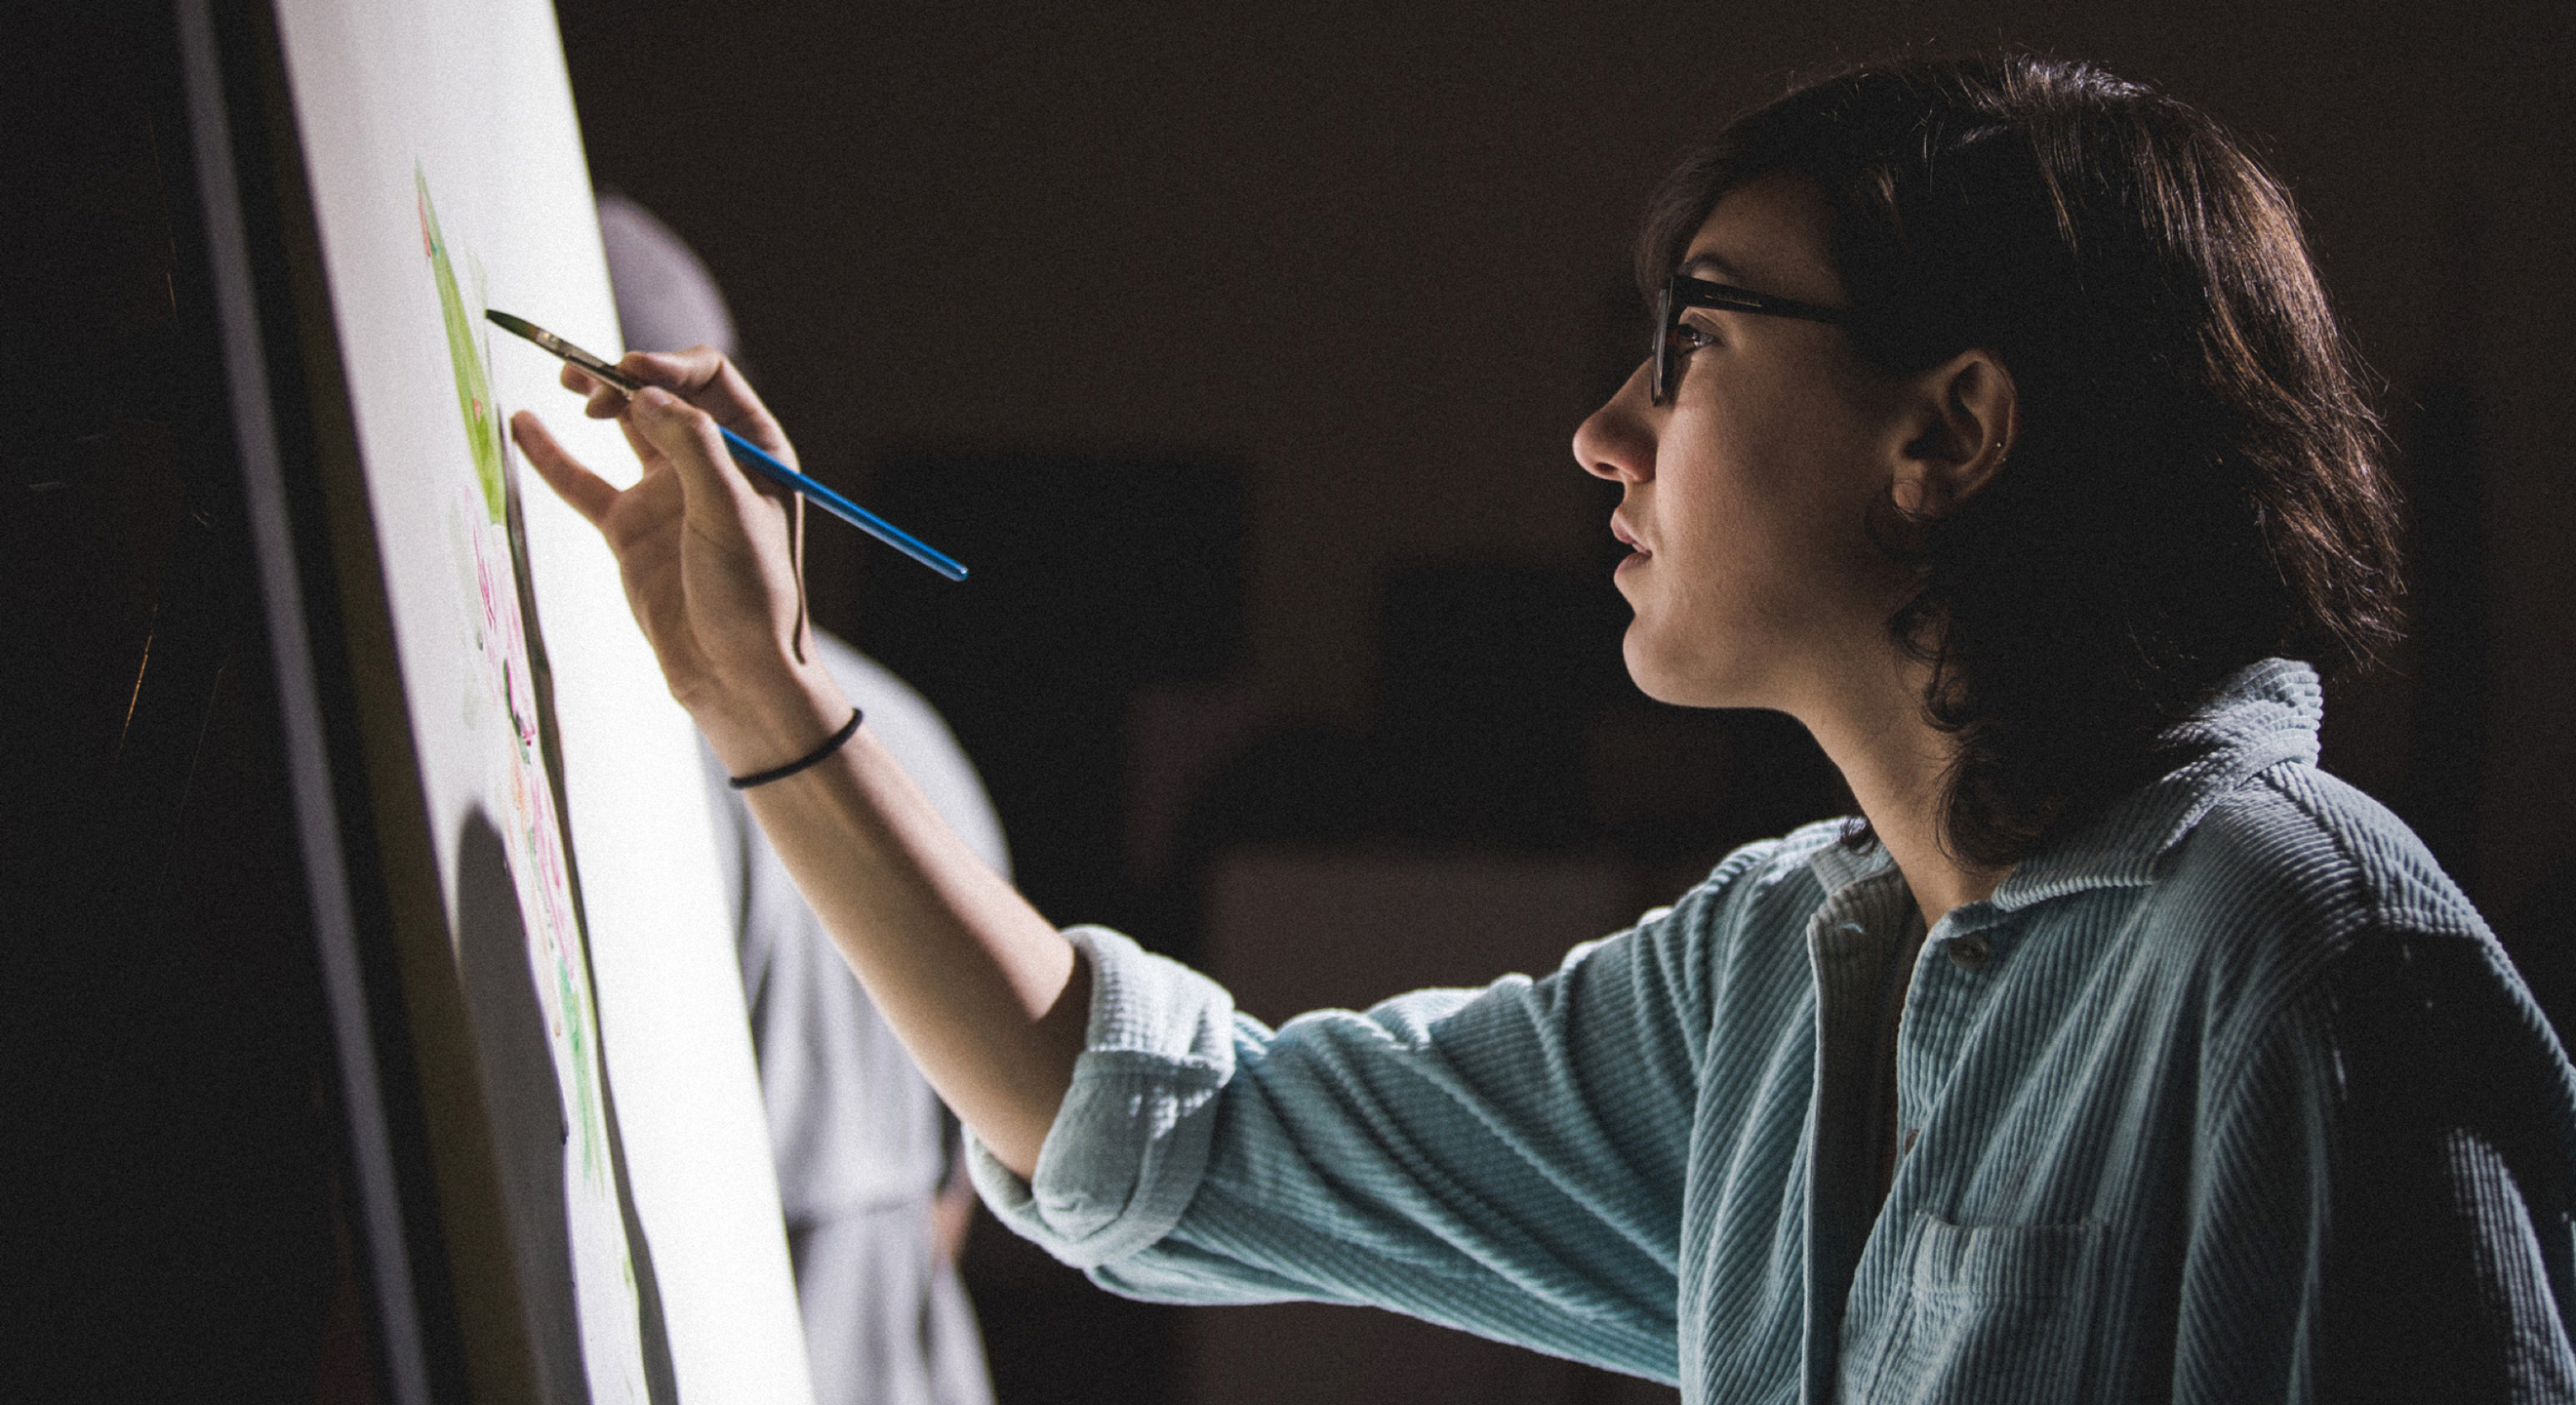 Southwestern student in Fine Arts class